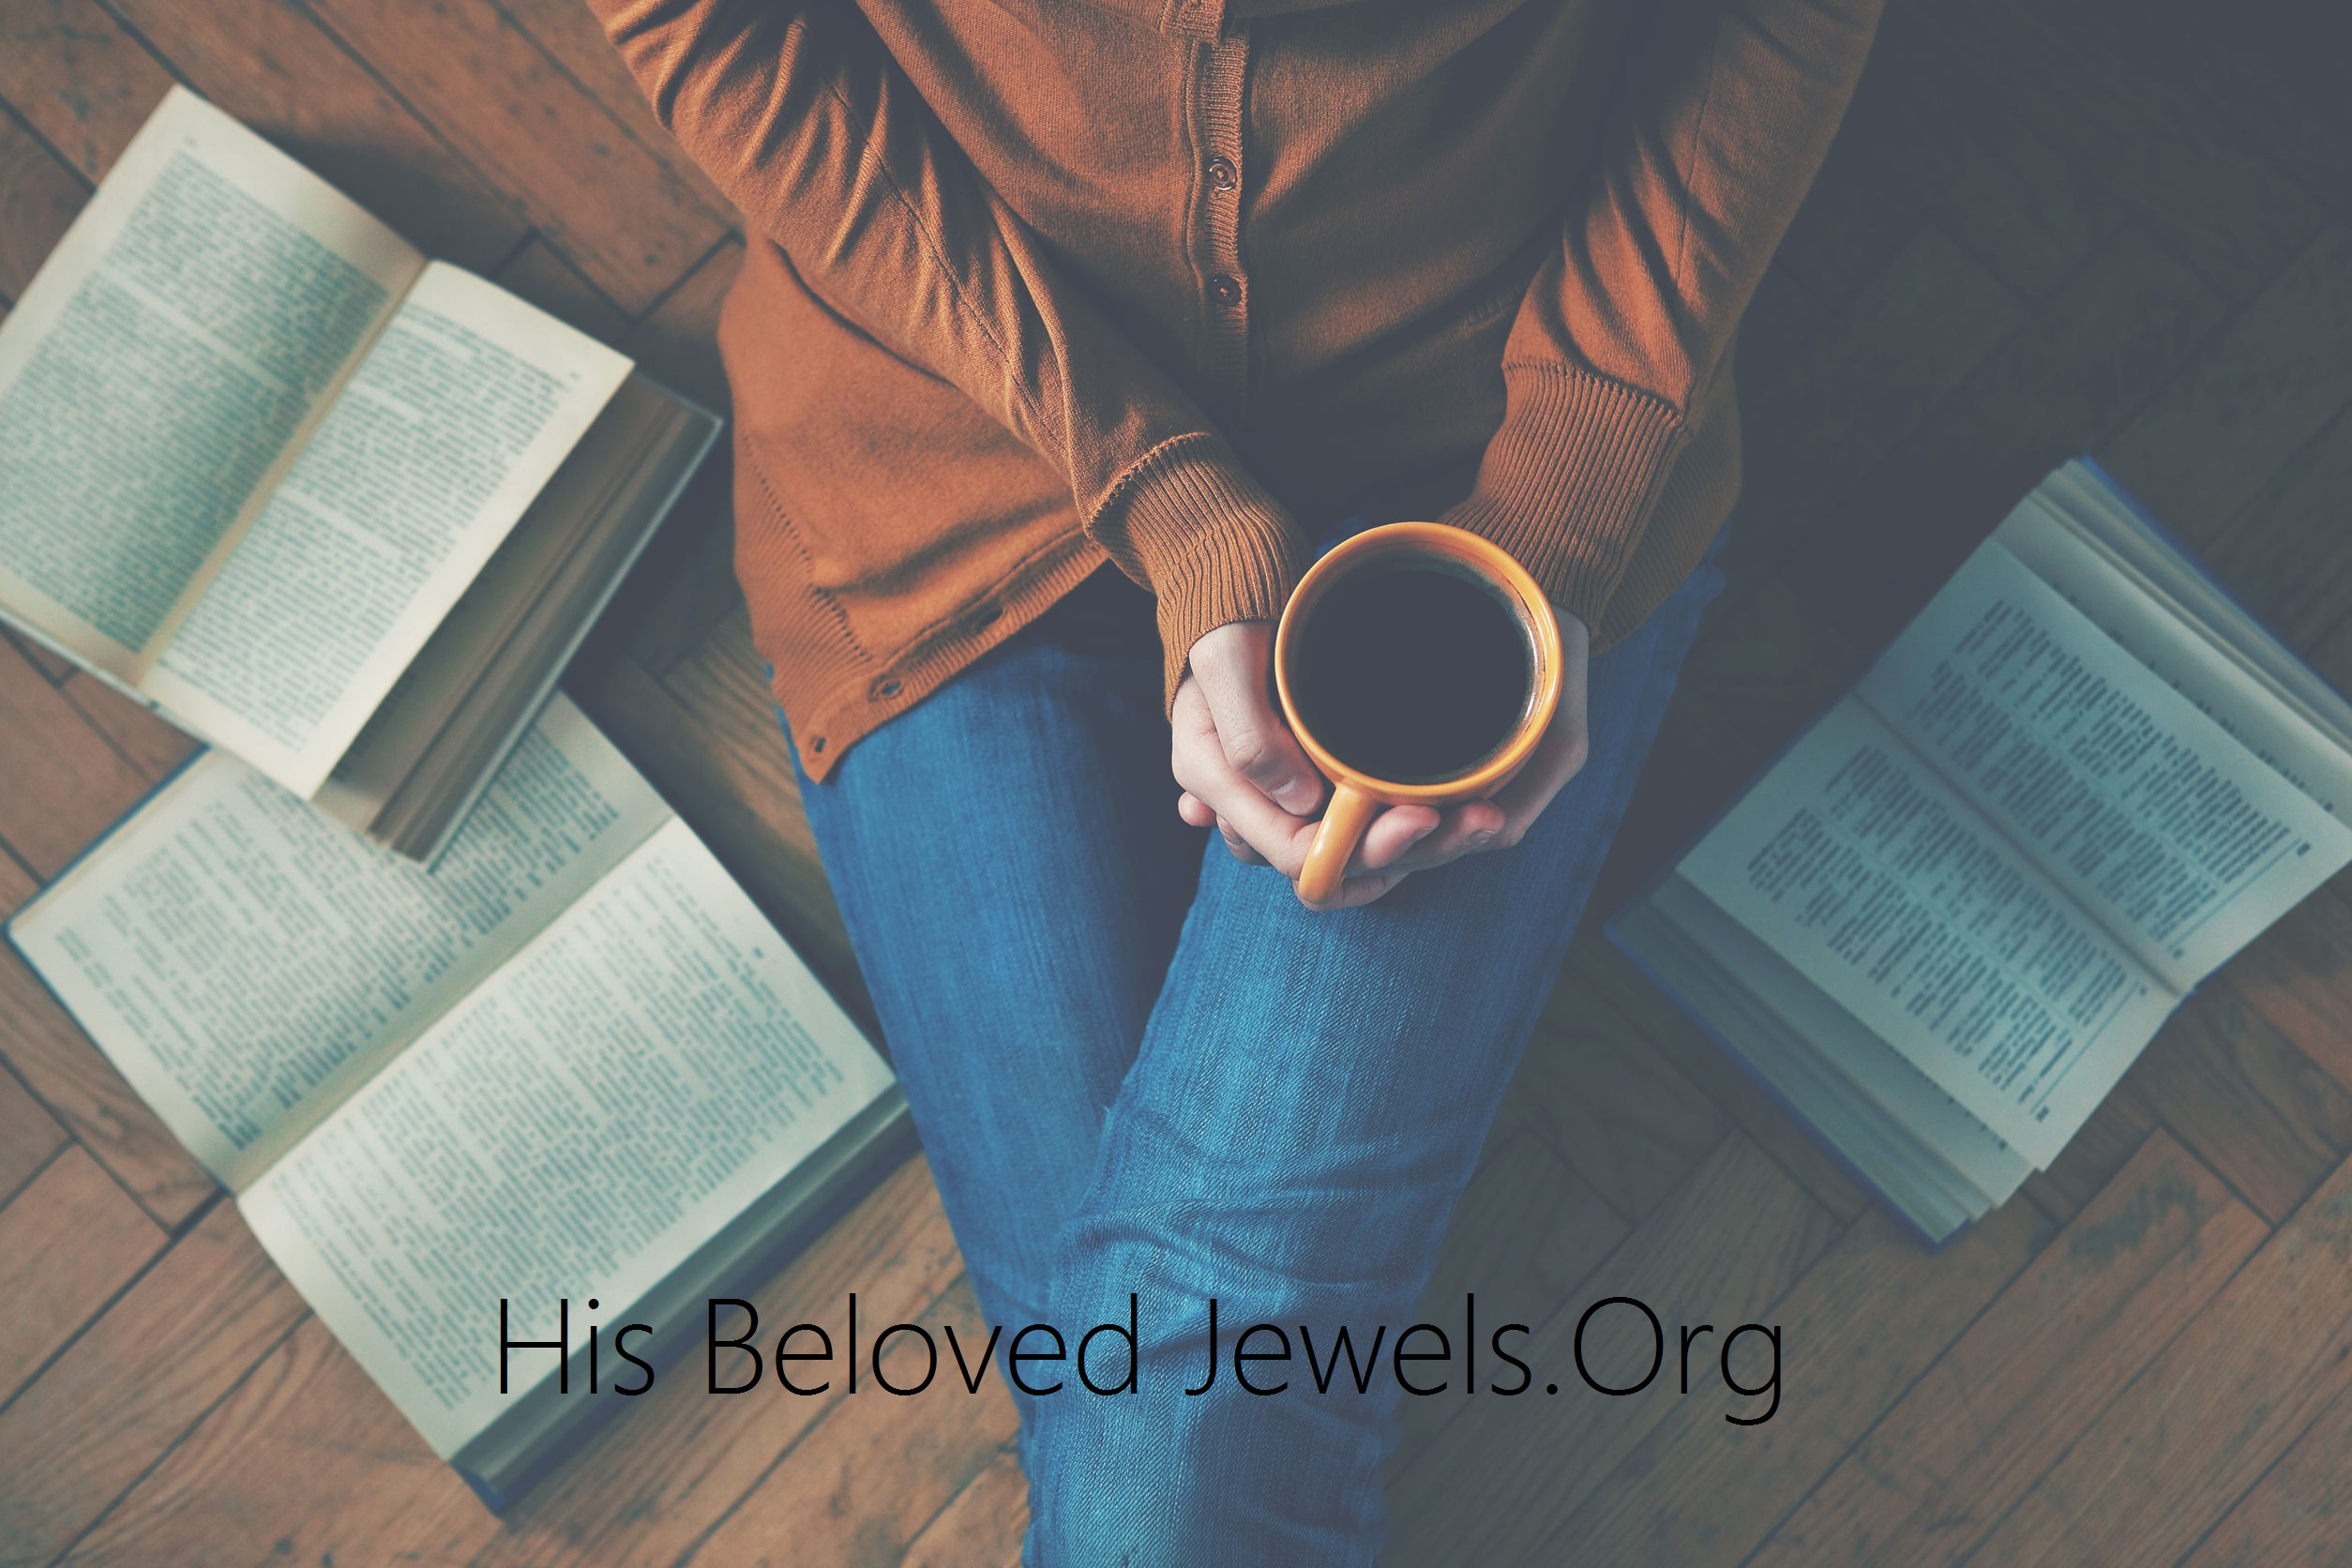 His Beloved Jewels